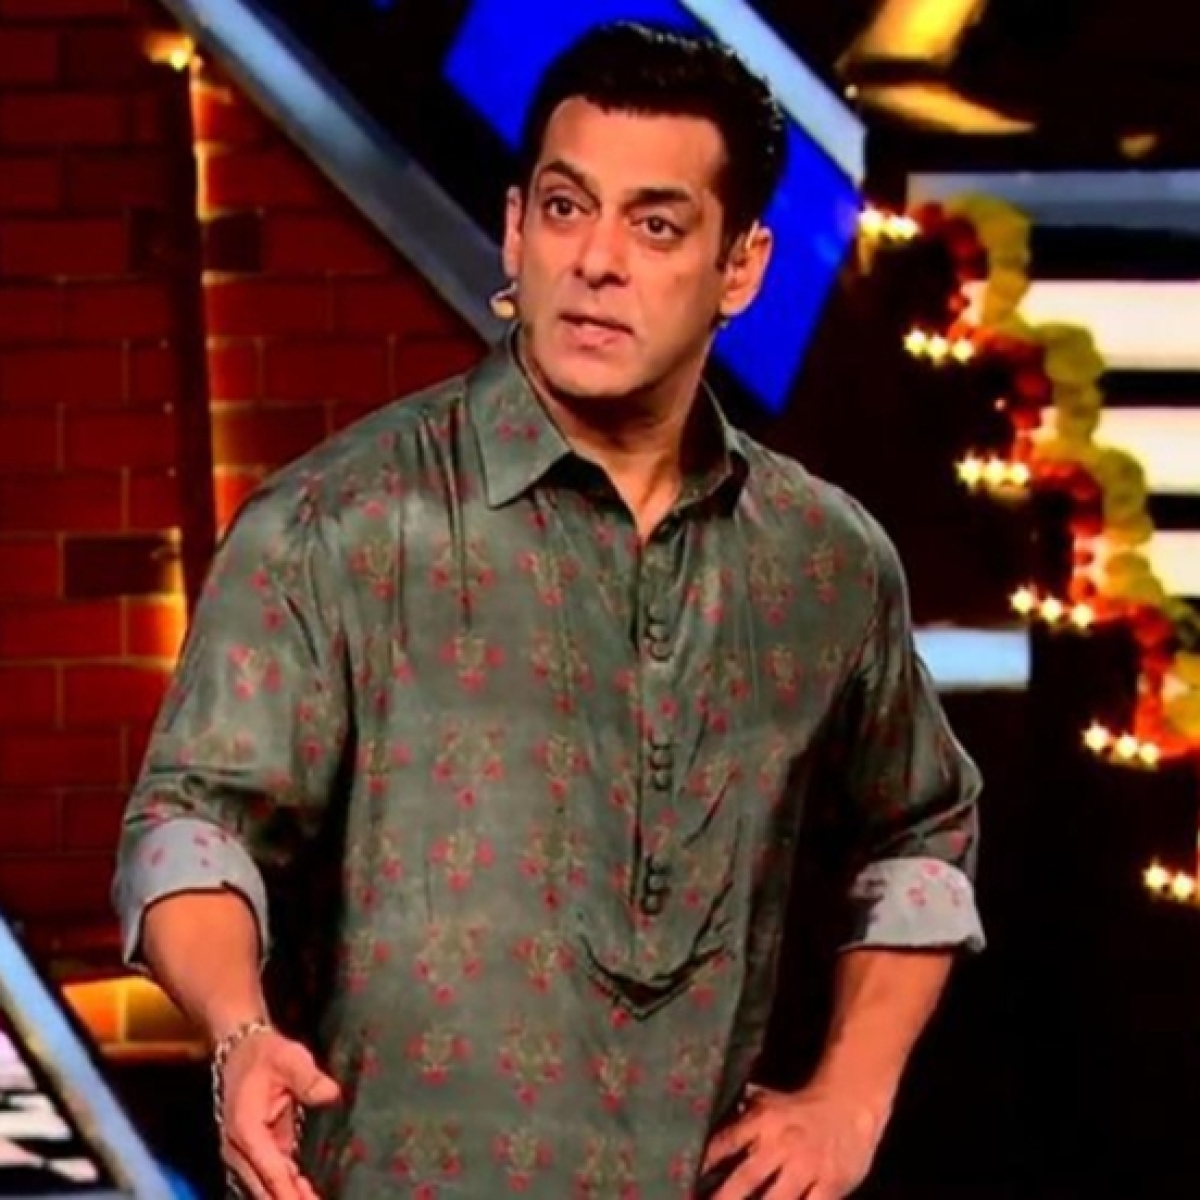 From Vivek Oberoi to Abhinav Kashyap: Bollywood personalities who felt the wrath of Salman Khan